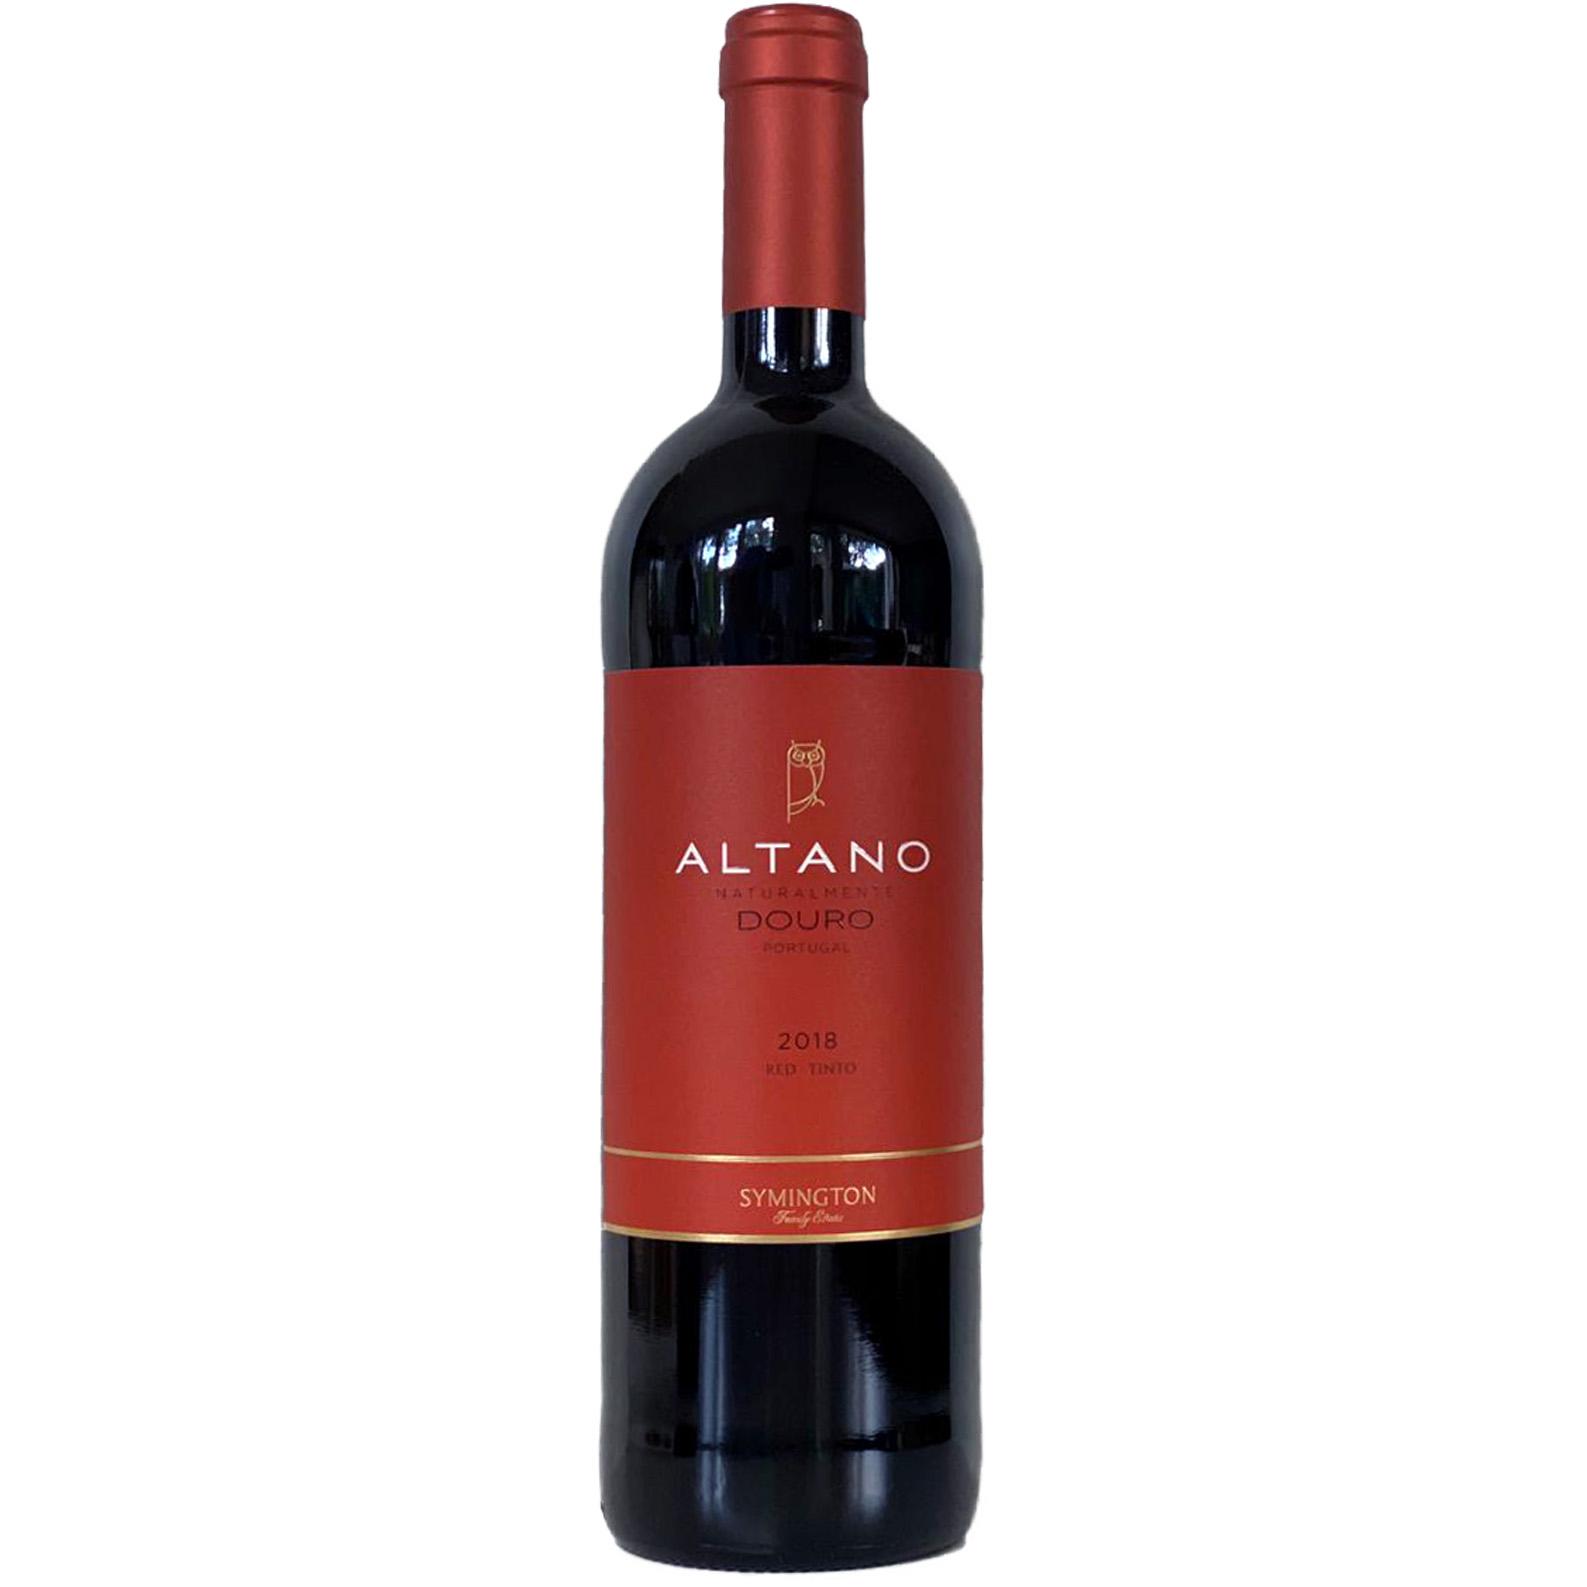 Altano Douro: unser Sommer-Rotwein 2018